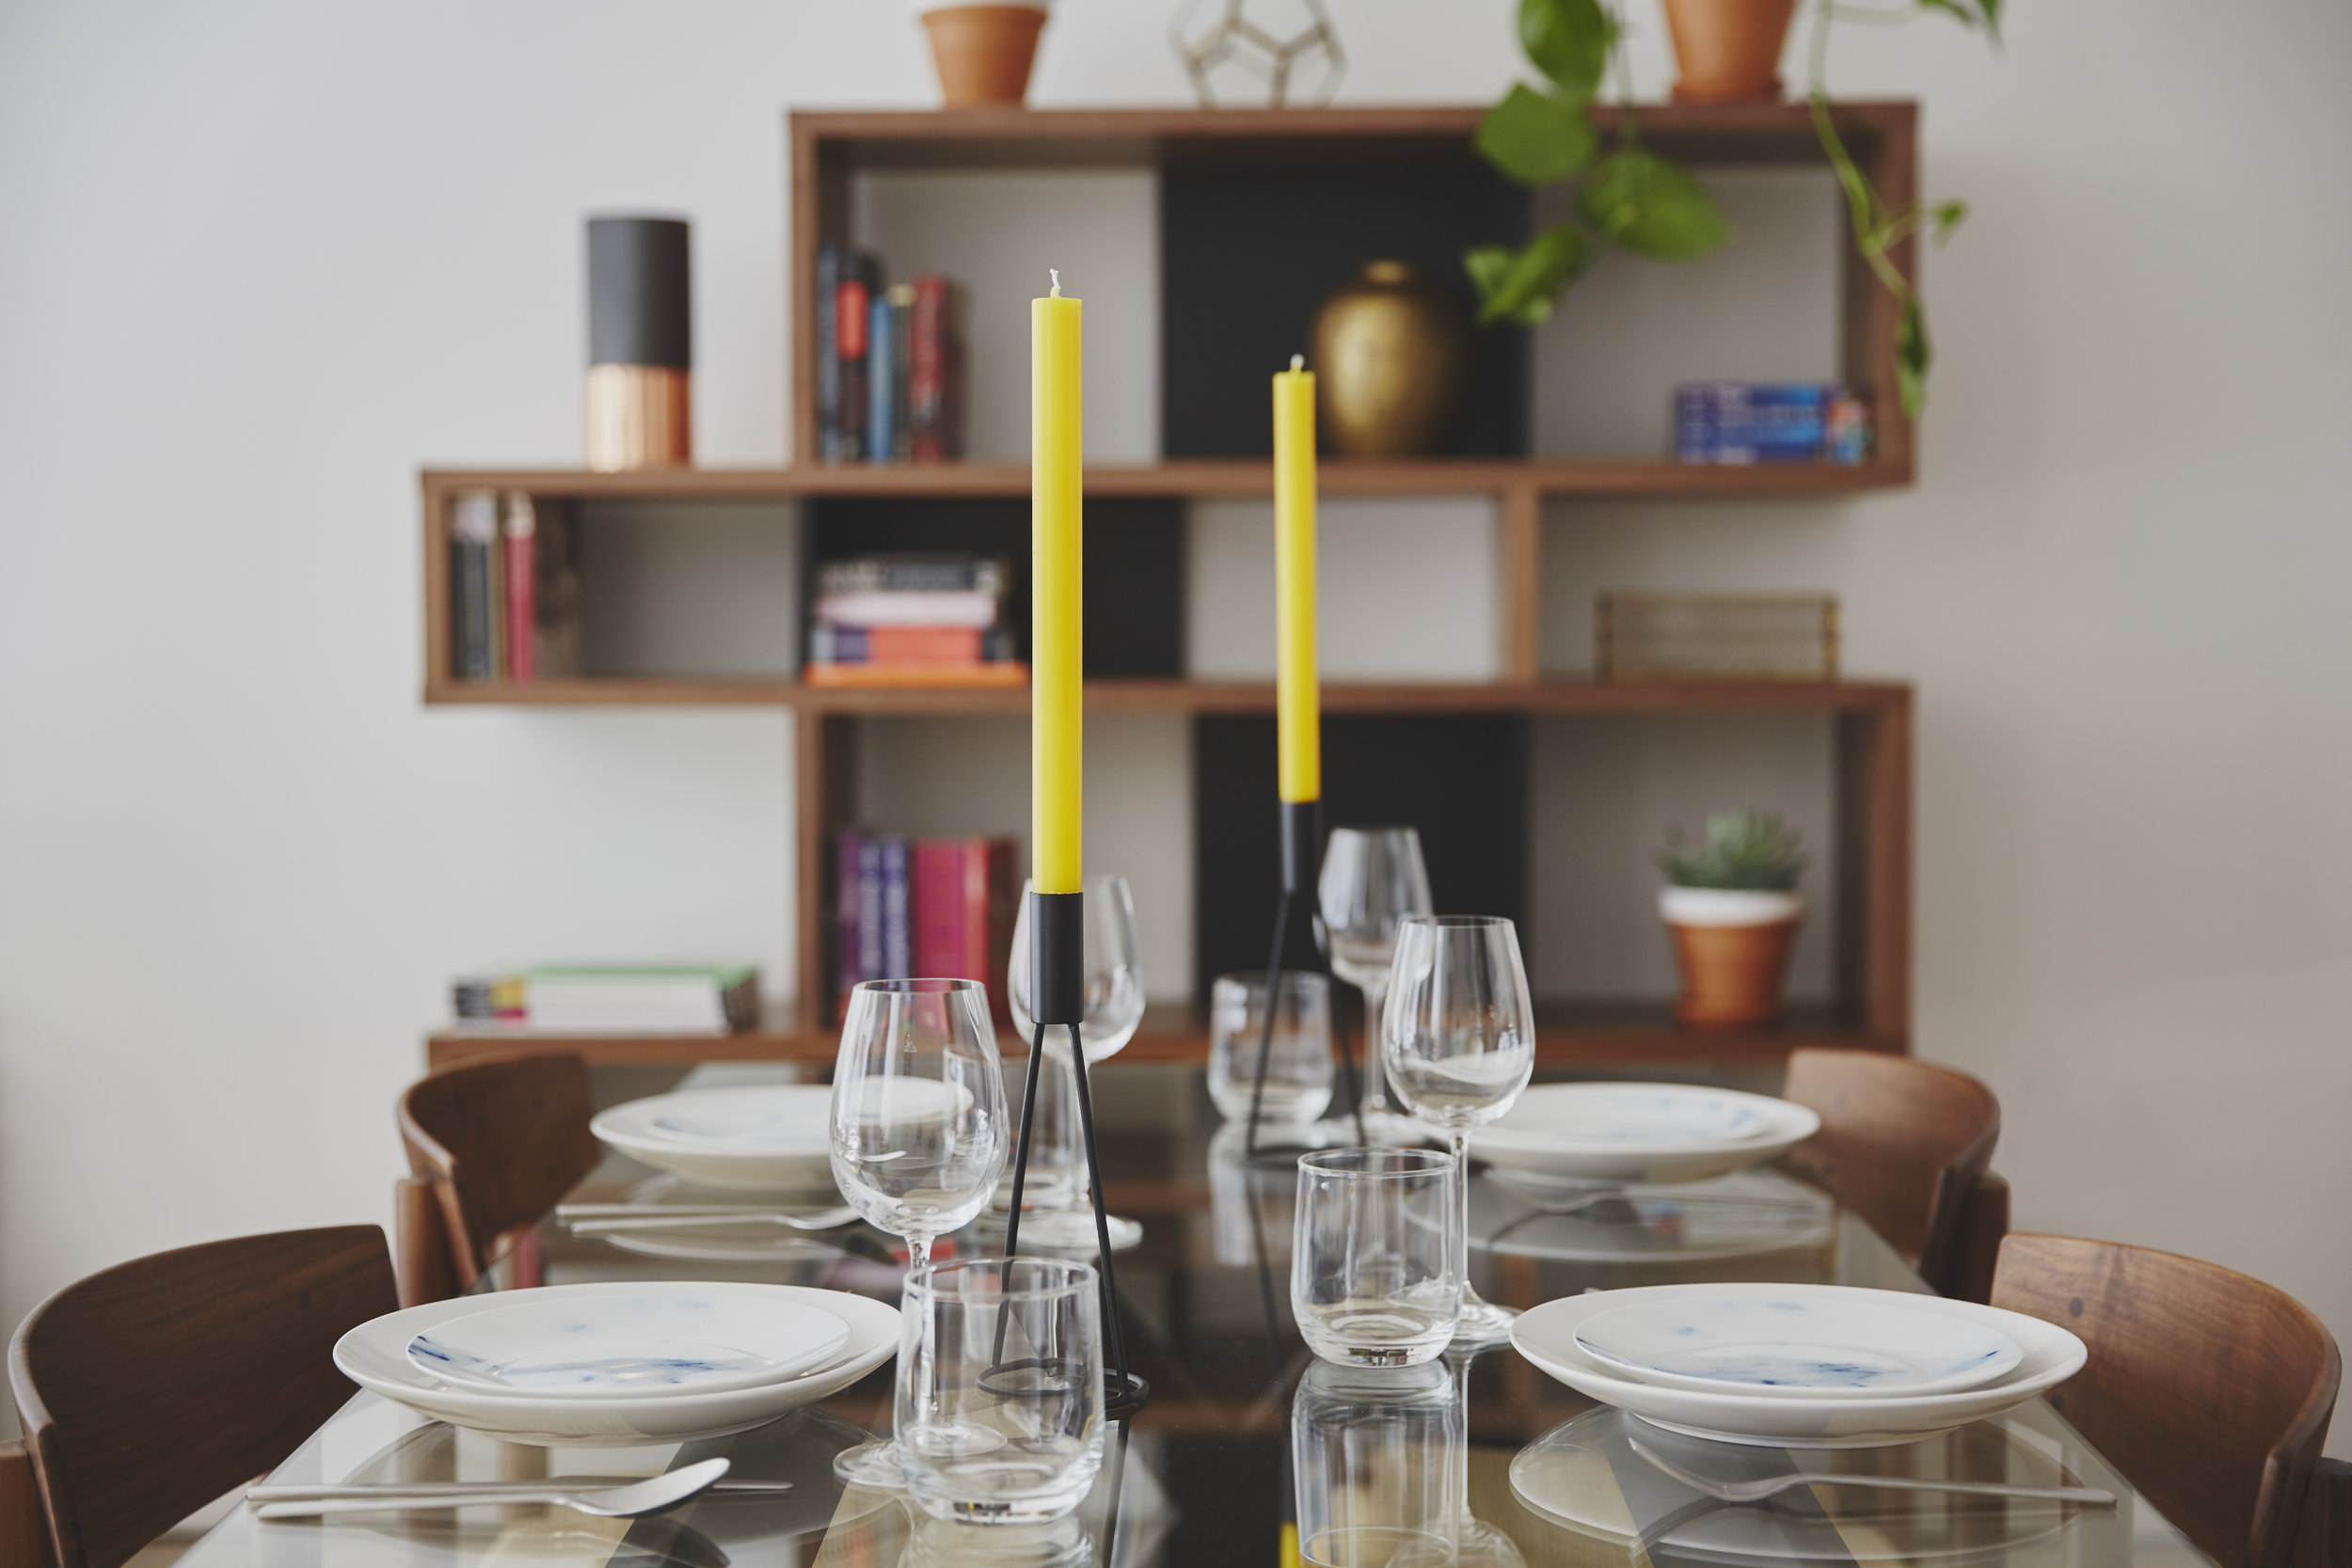 Stylish Interiors Dining Cuckooz Studionatalie Natalie Papageorgiadis